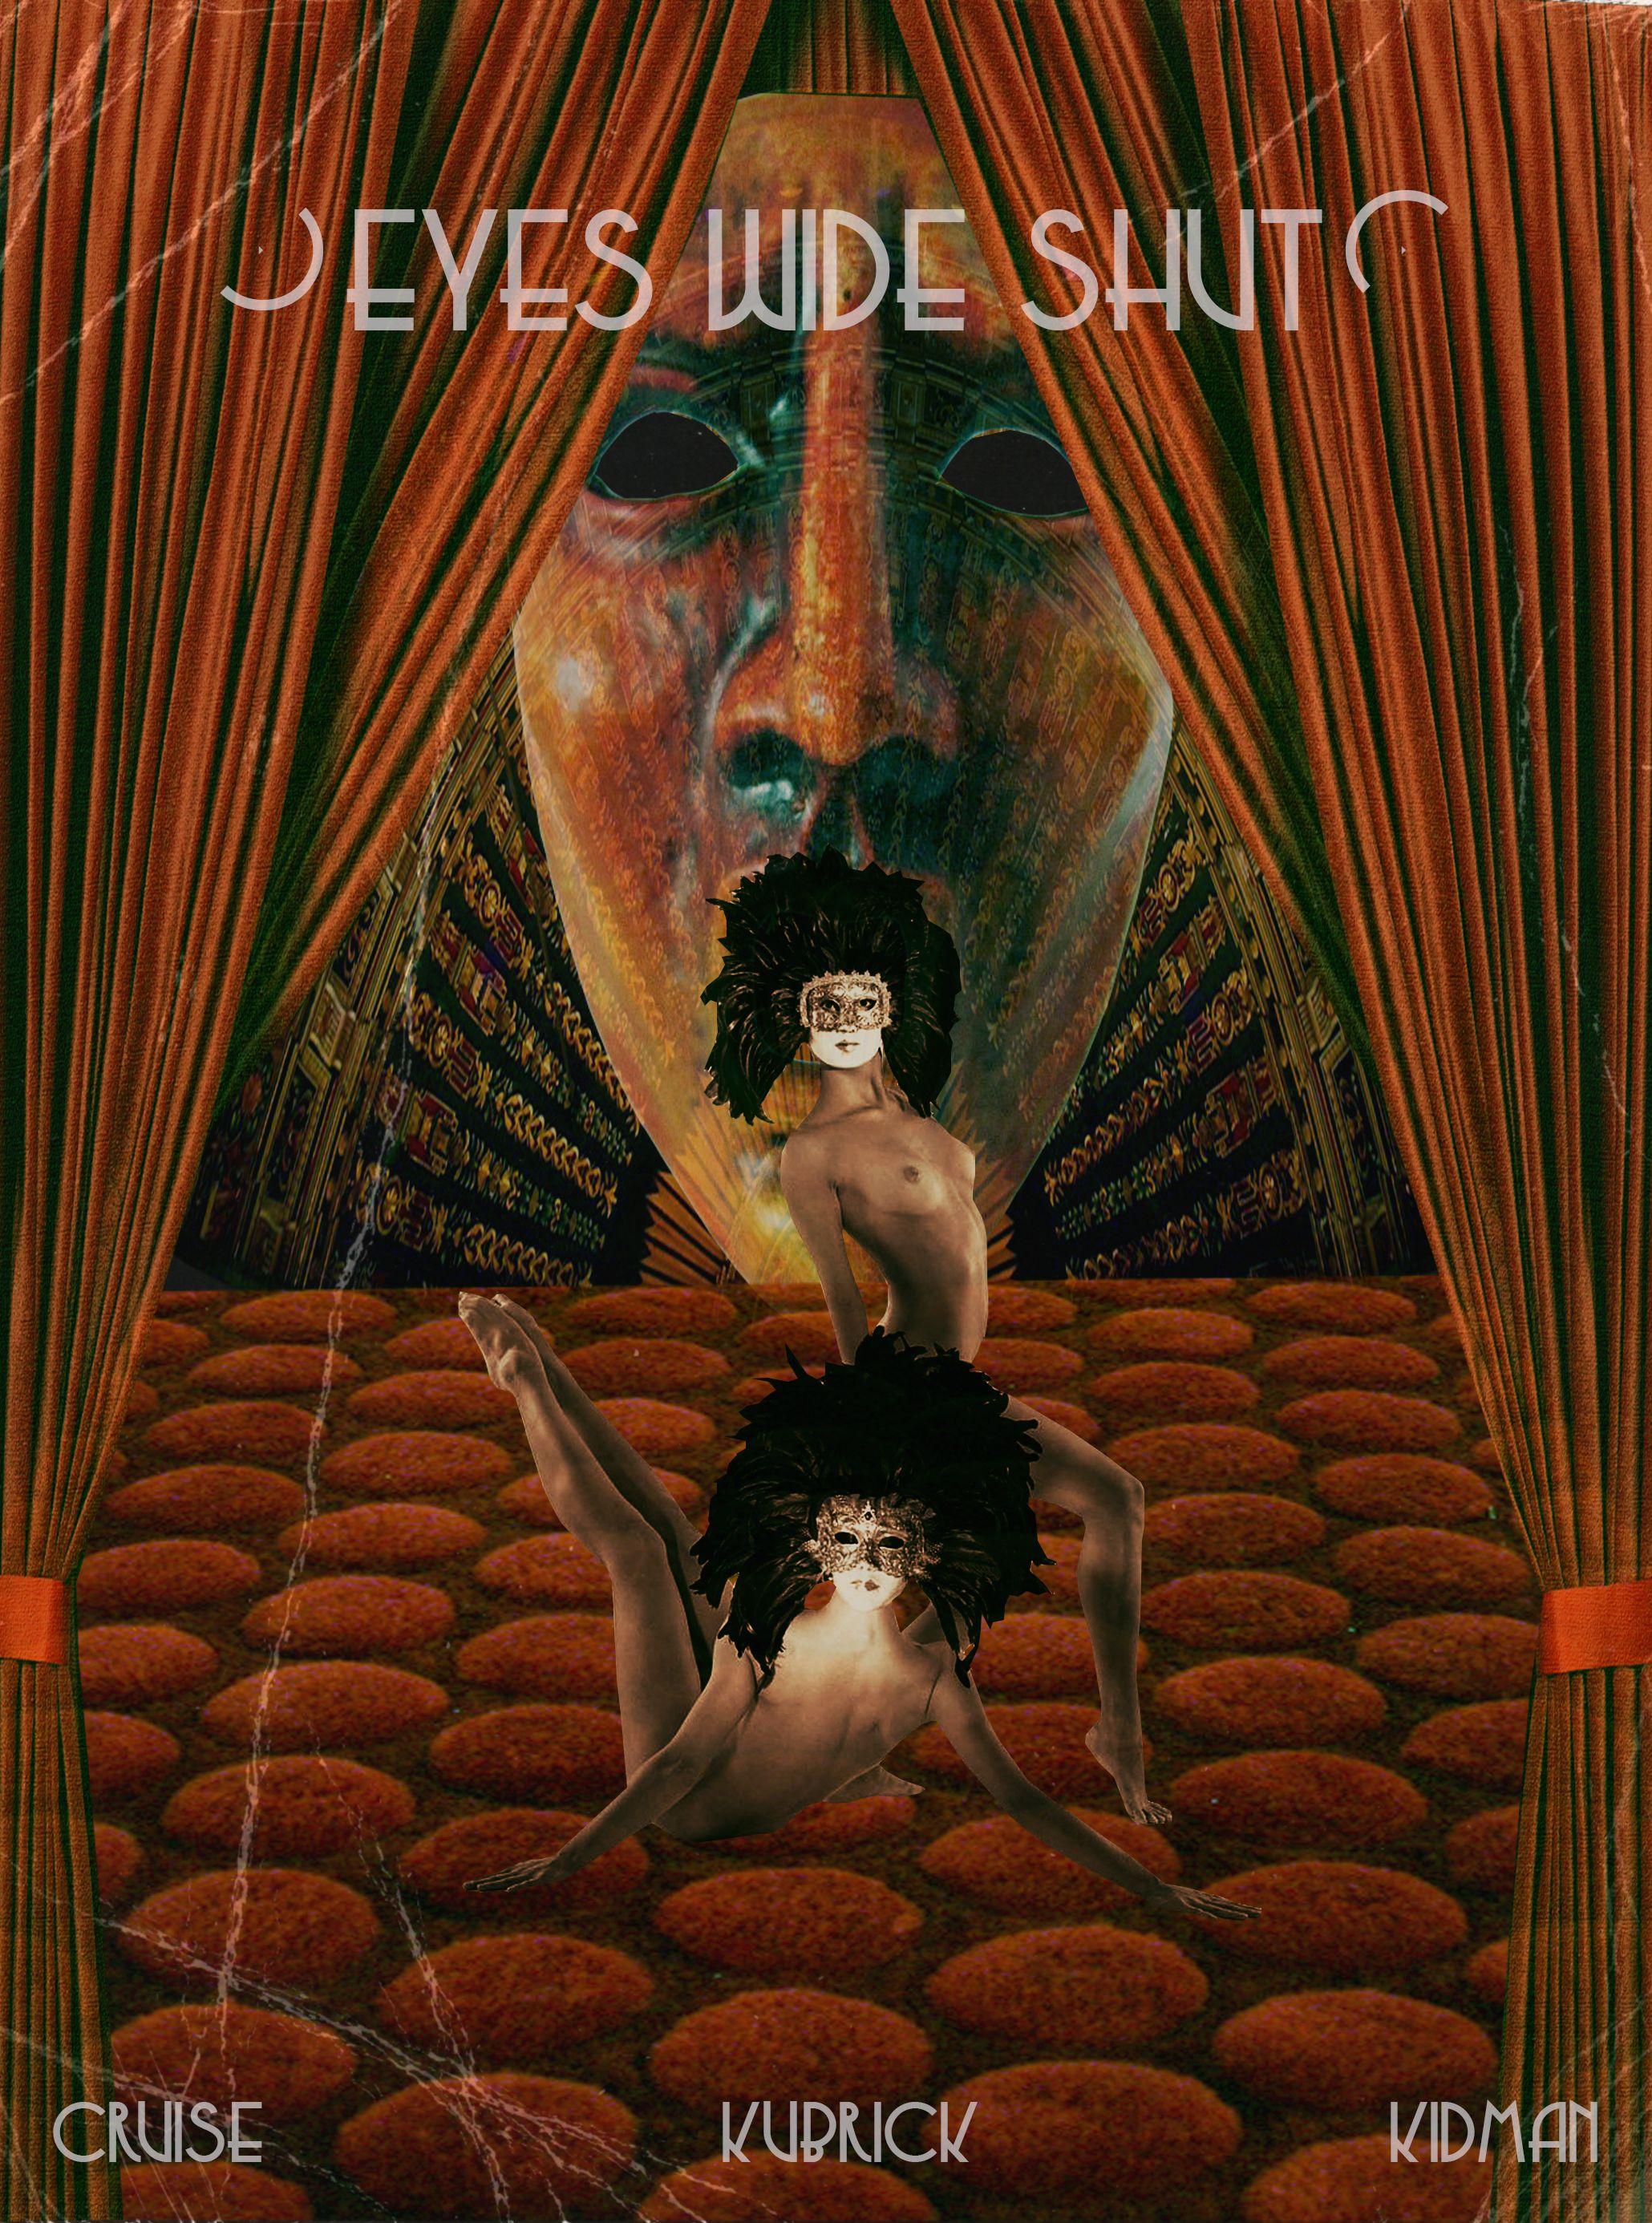 Eyes Wide Shut Alternate Movie Poster © Scarlet Phoebe, 2013 www.serpentfire.ca